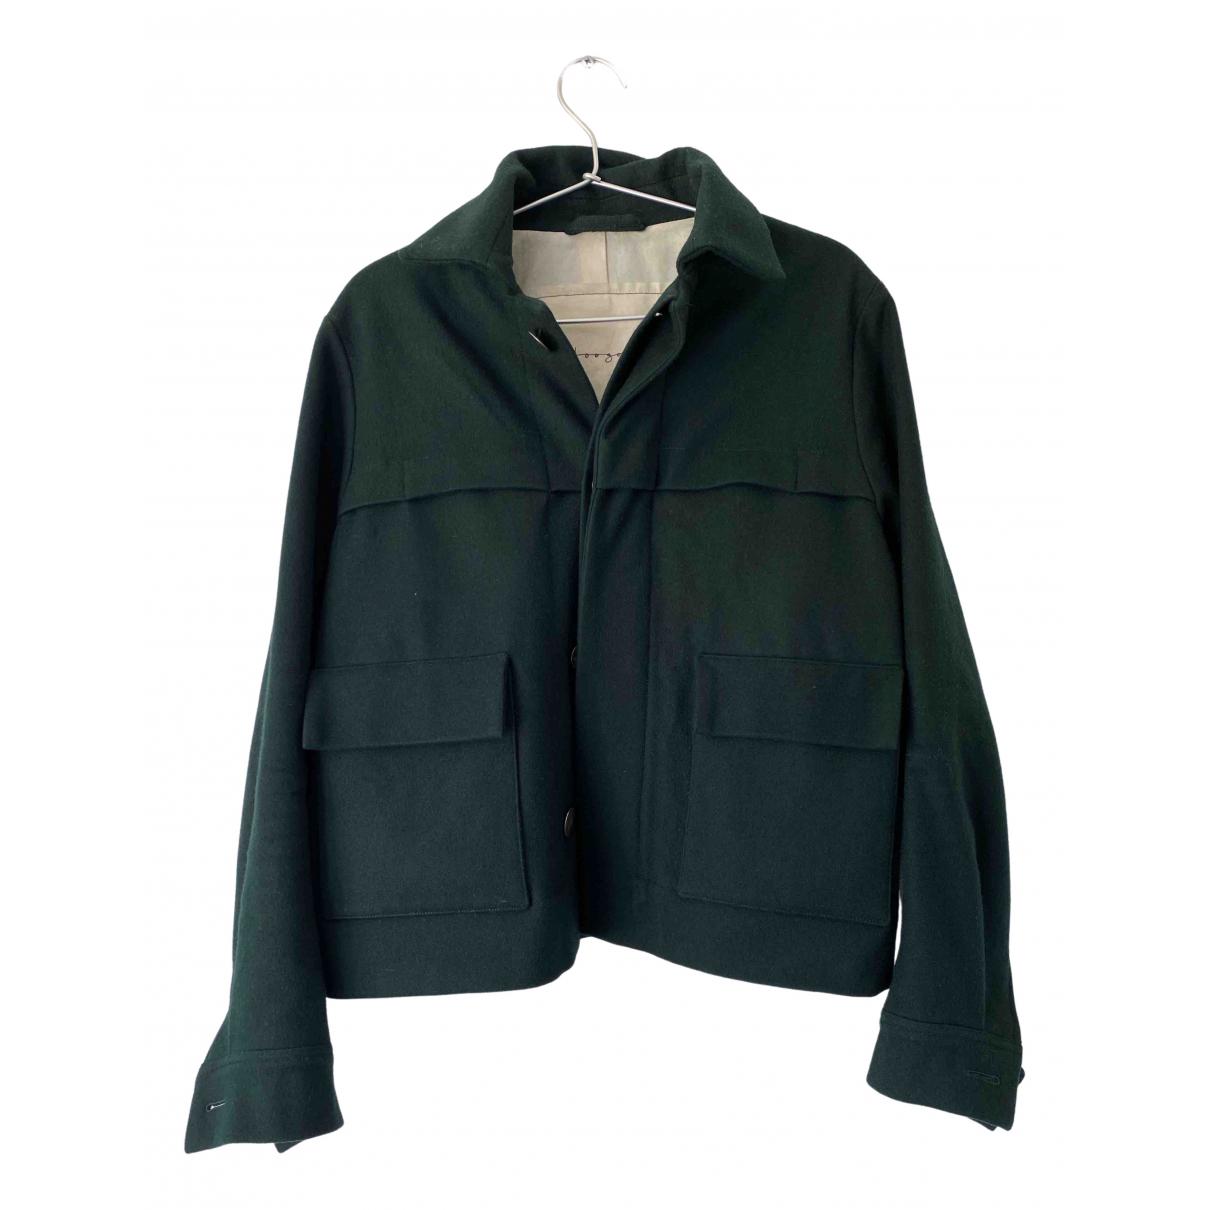 Toogood - Veste   pour femme en laine - vert